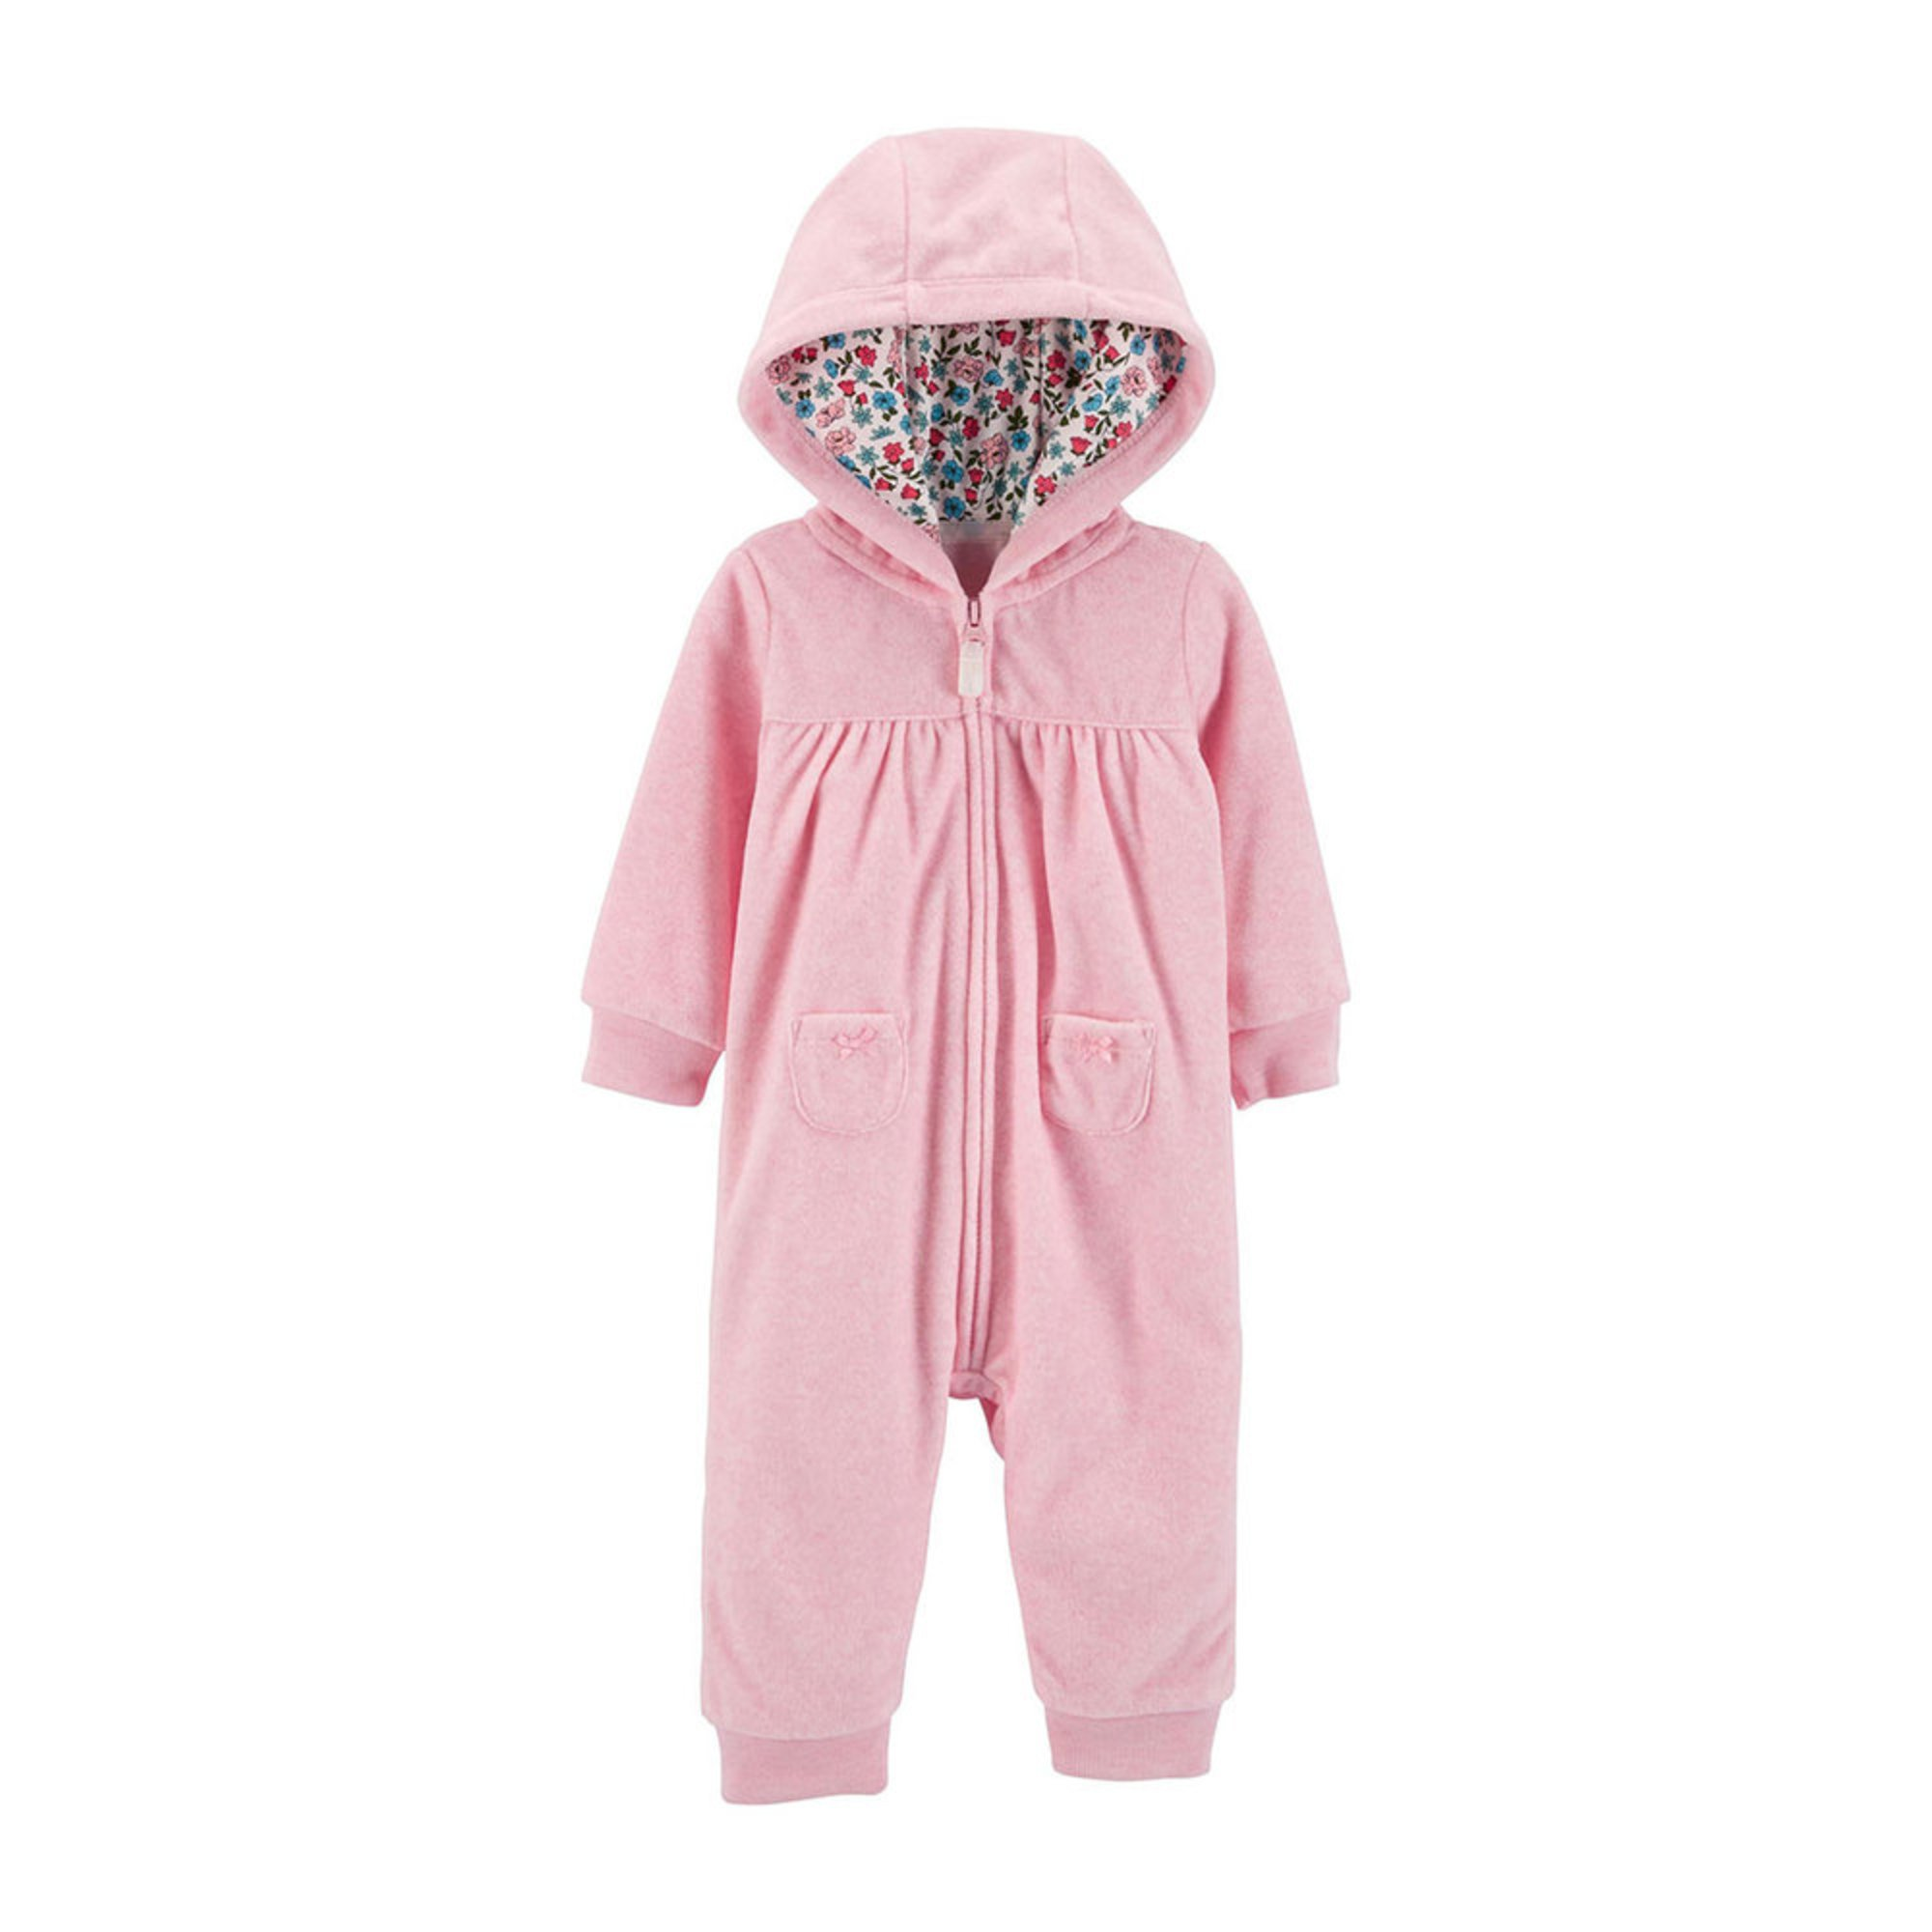 47baebc4e Carter s Baby Girls  Bear Hooded Fleece Romper